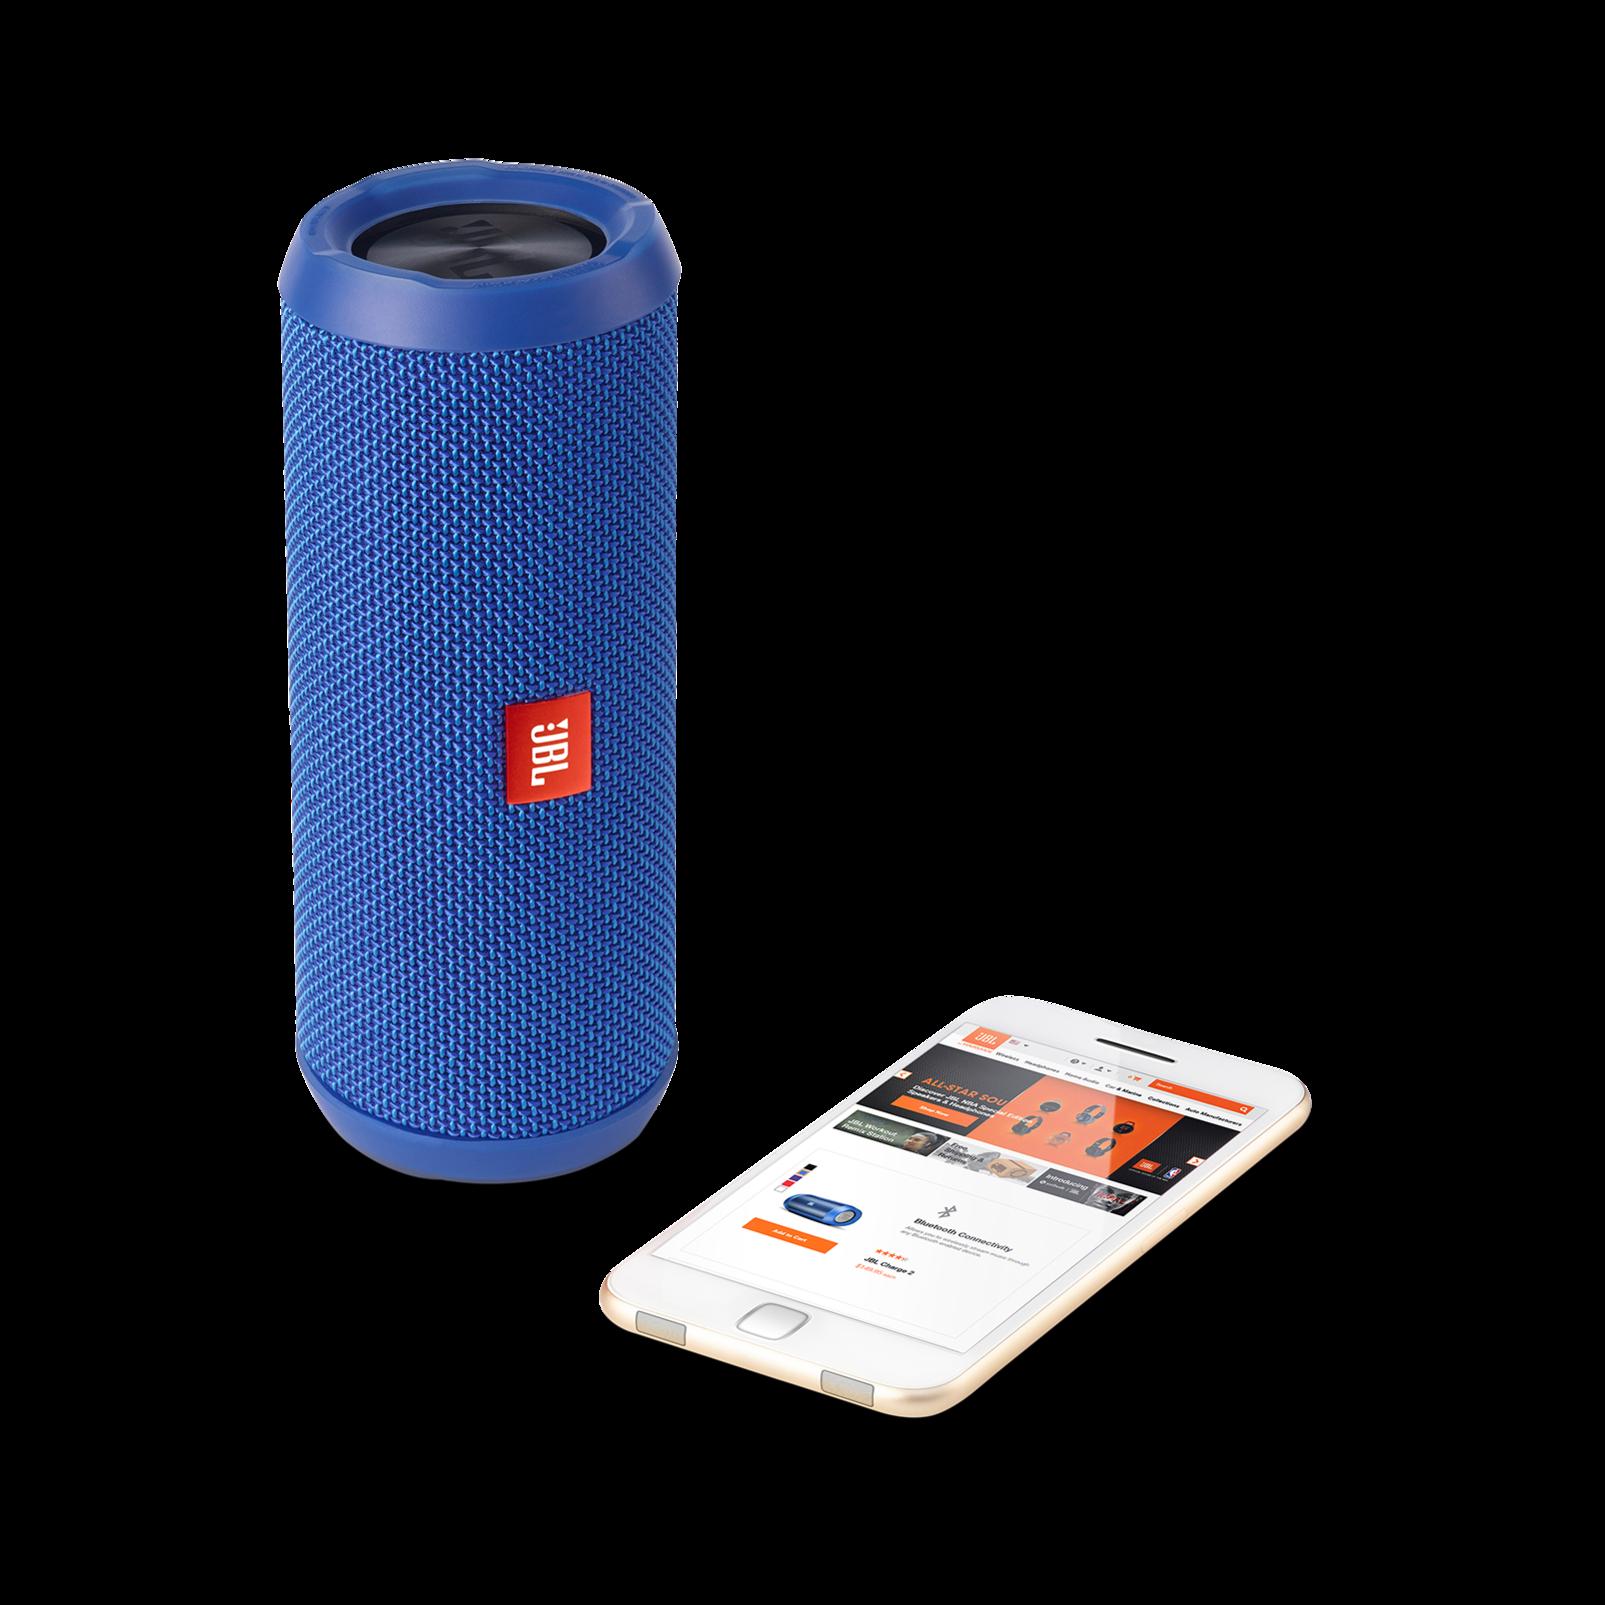 JBL Flip 3 - Blue - Splashproof portable Bluetooth speaker with powerful sound and speakerphone technology - Detailshot 1